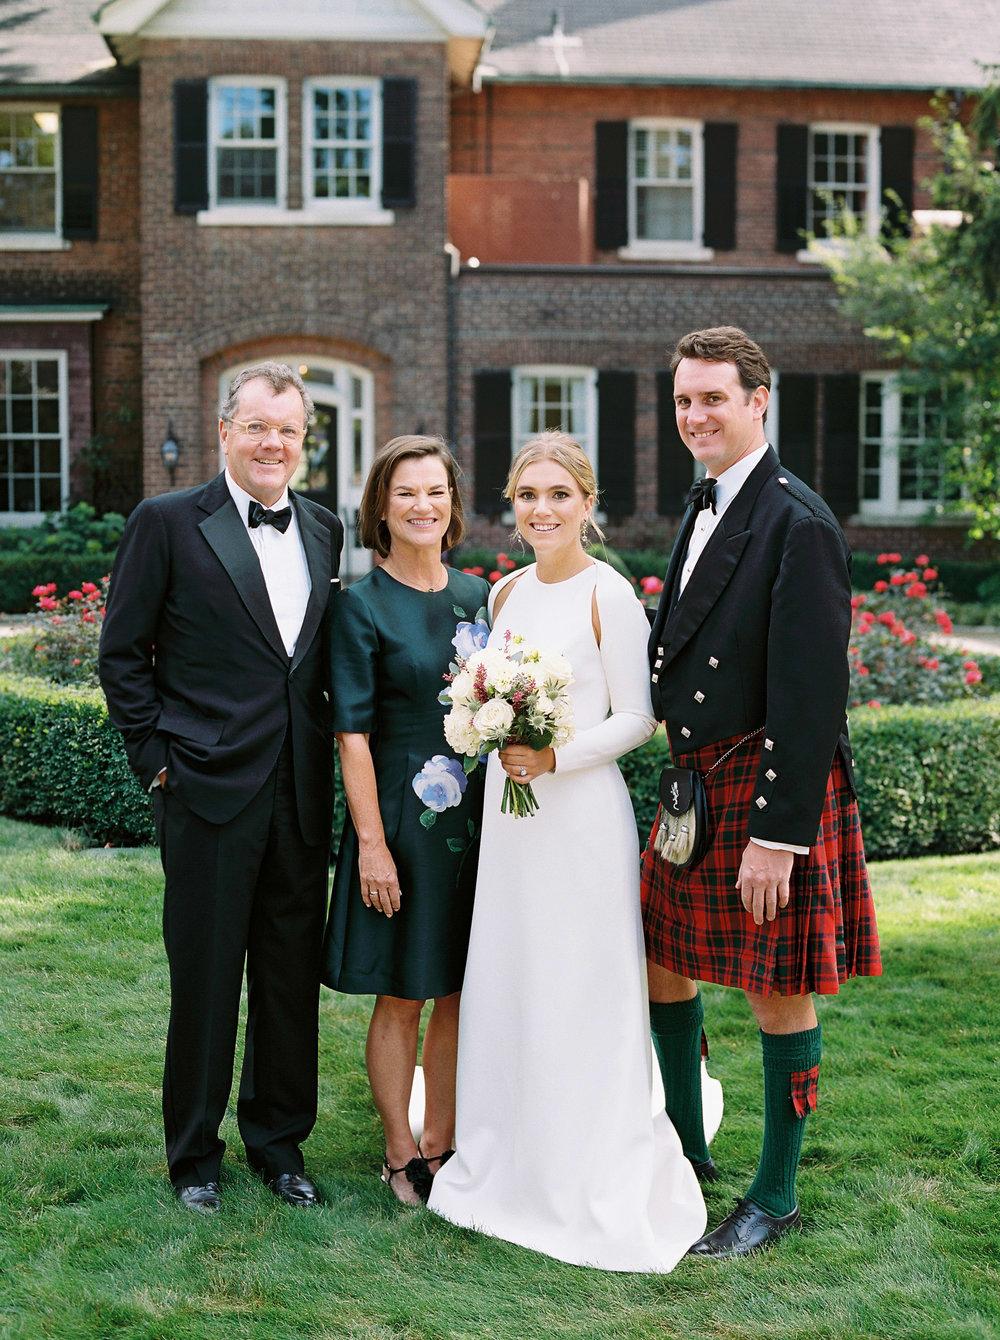 0216-Geneva-Ian-Wedding-Toronto Golf Club-When He Found Her-TorontoPhotographer.jpg